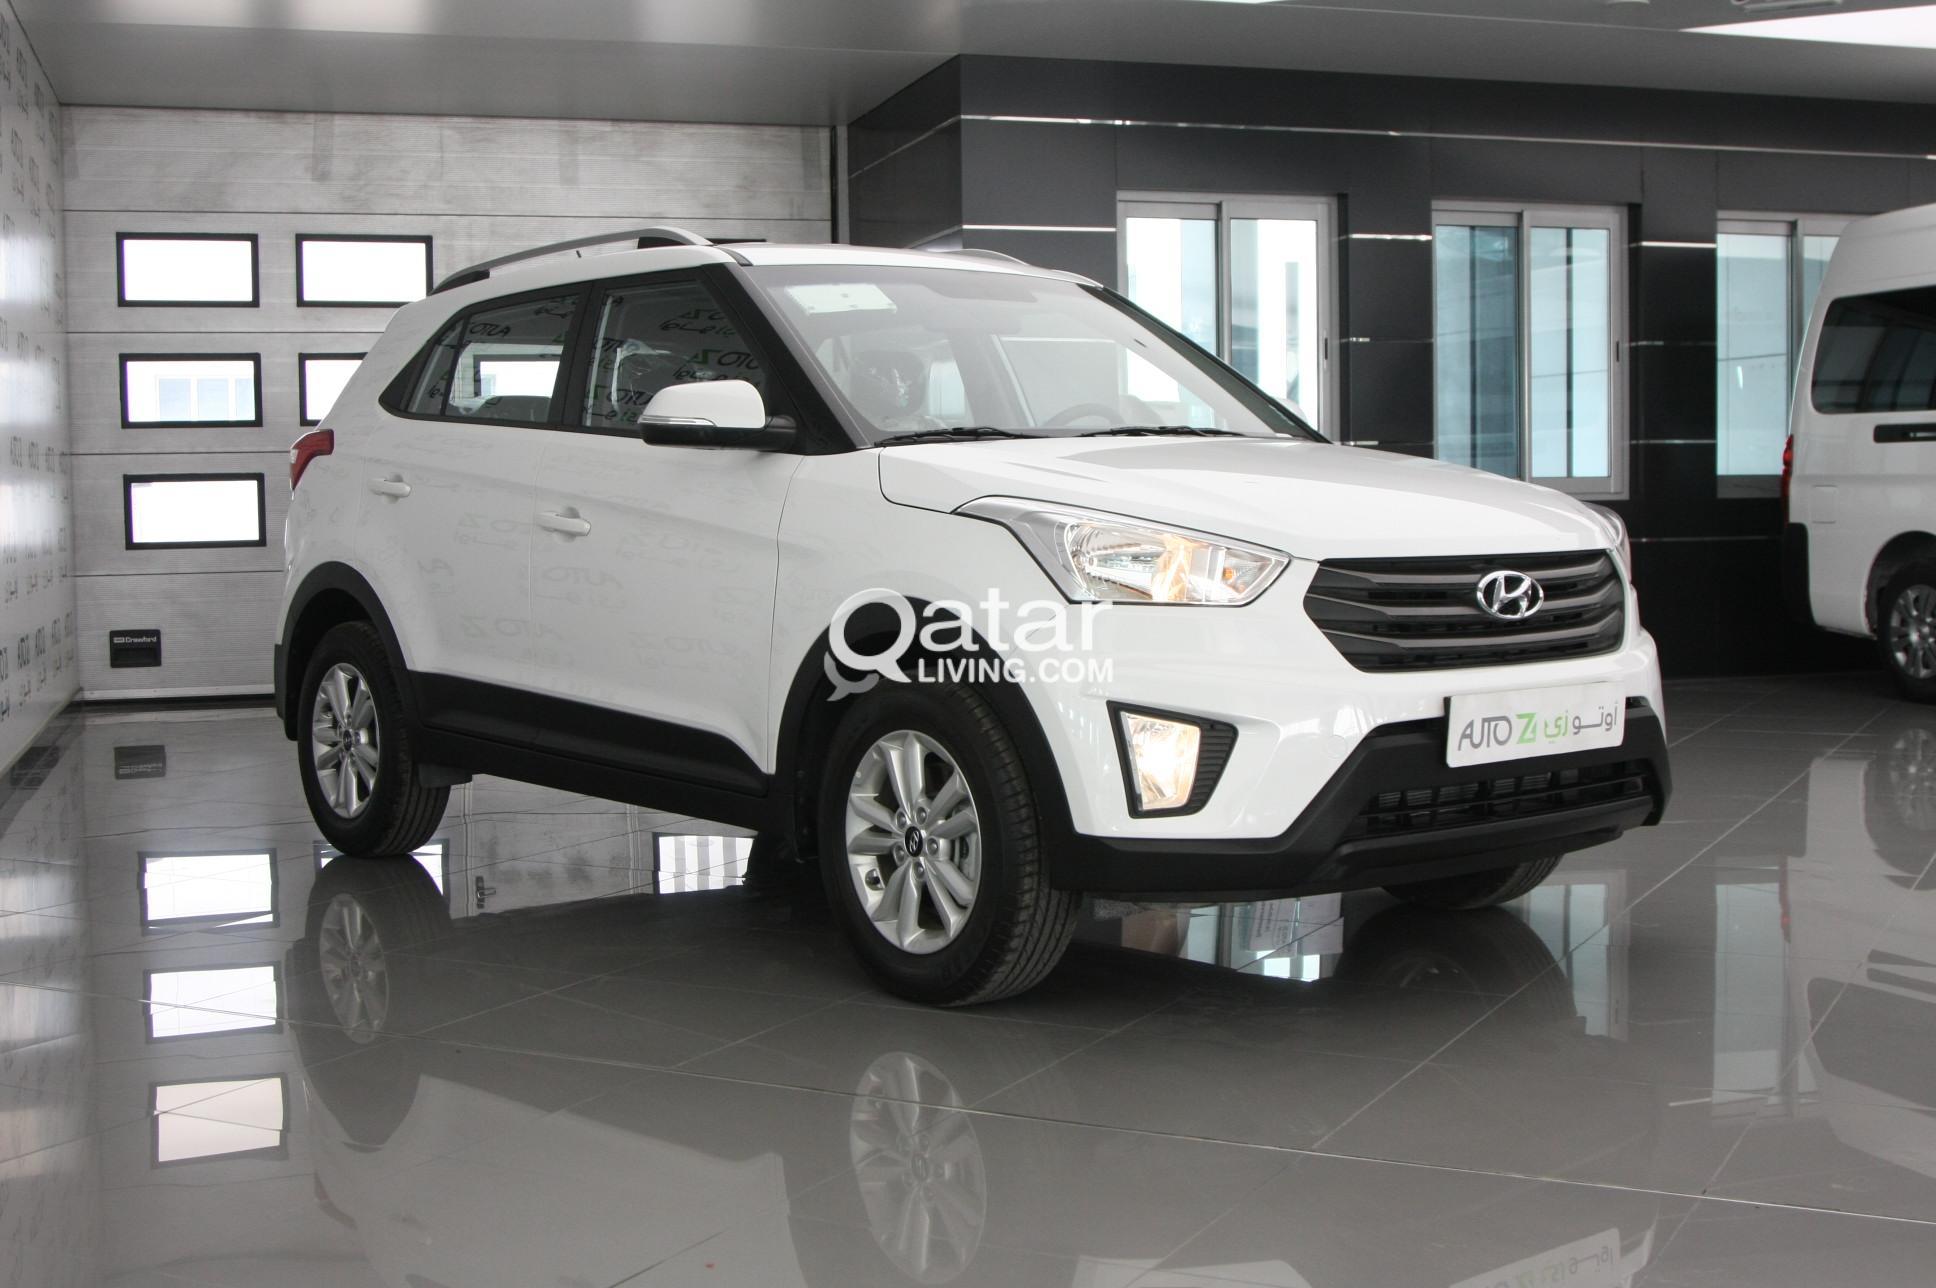 Hyundai Creta 2018 Qatar Living